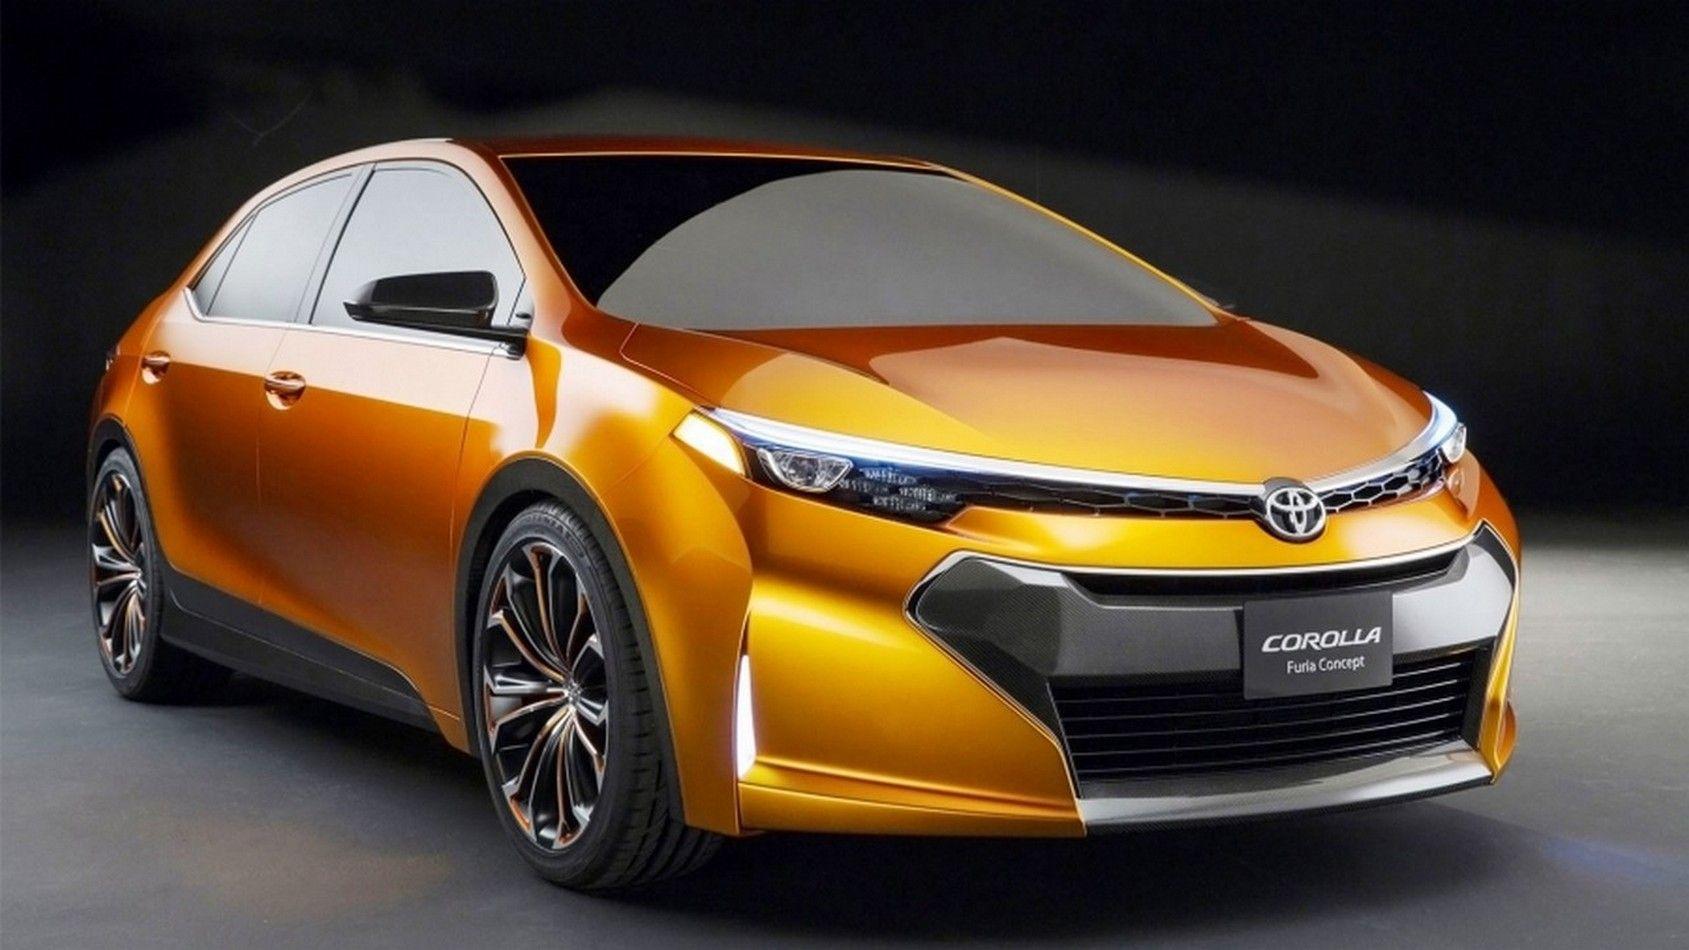 2020 Toyota Corolla Furia Concept Car Toyota Corolla Mobil Toyota